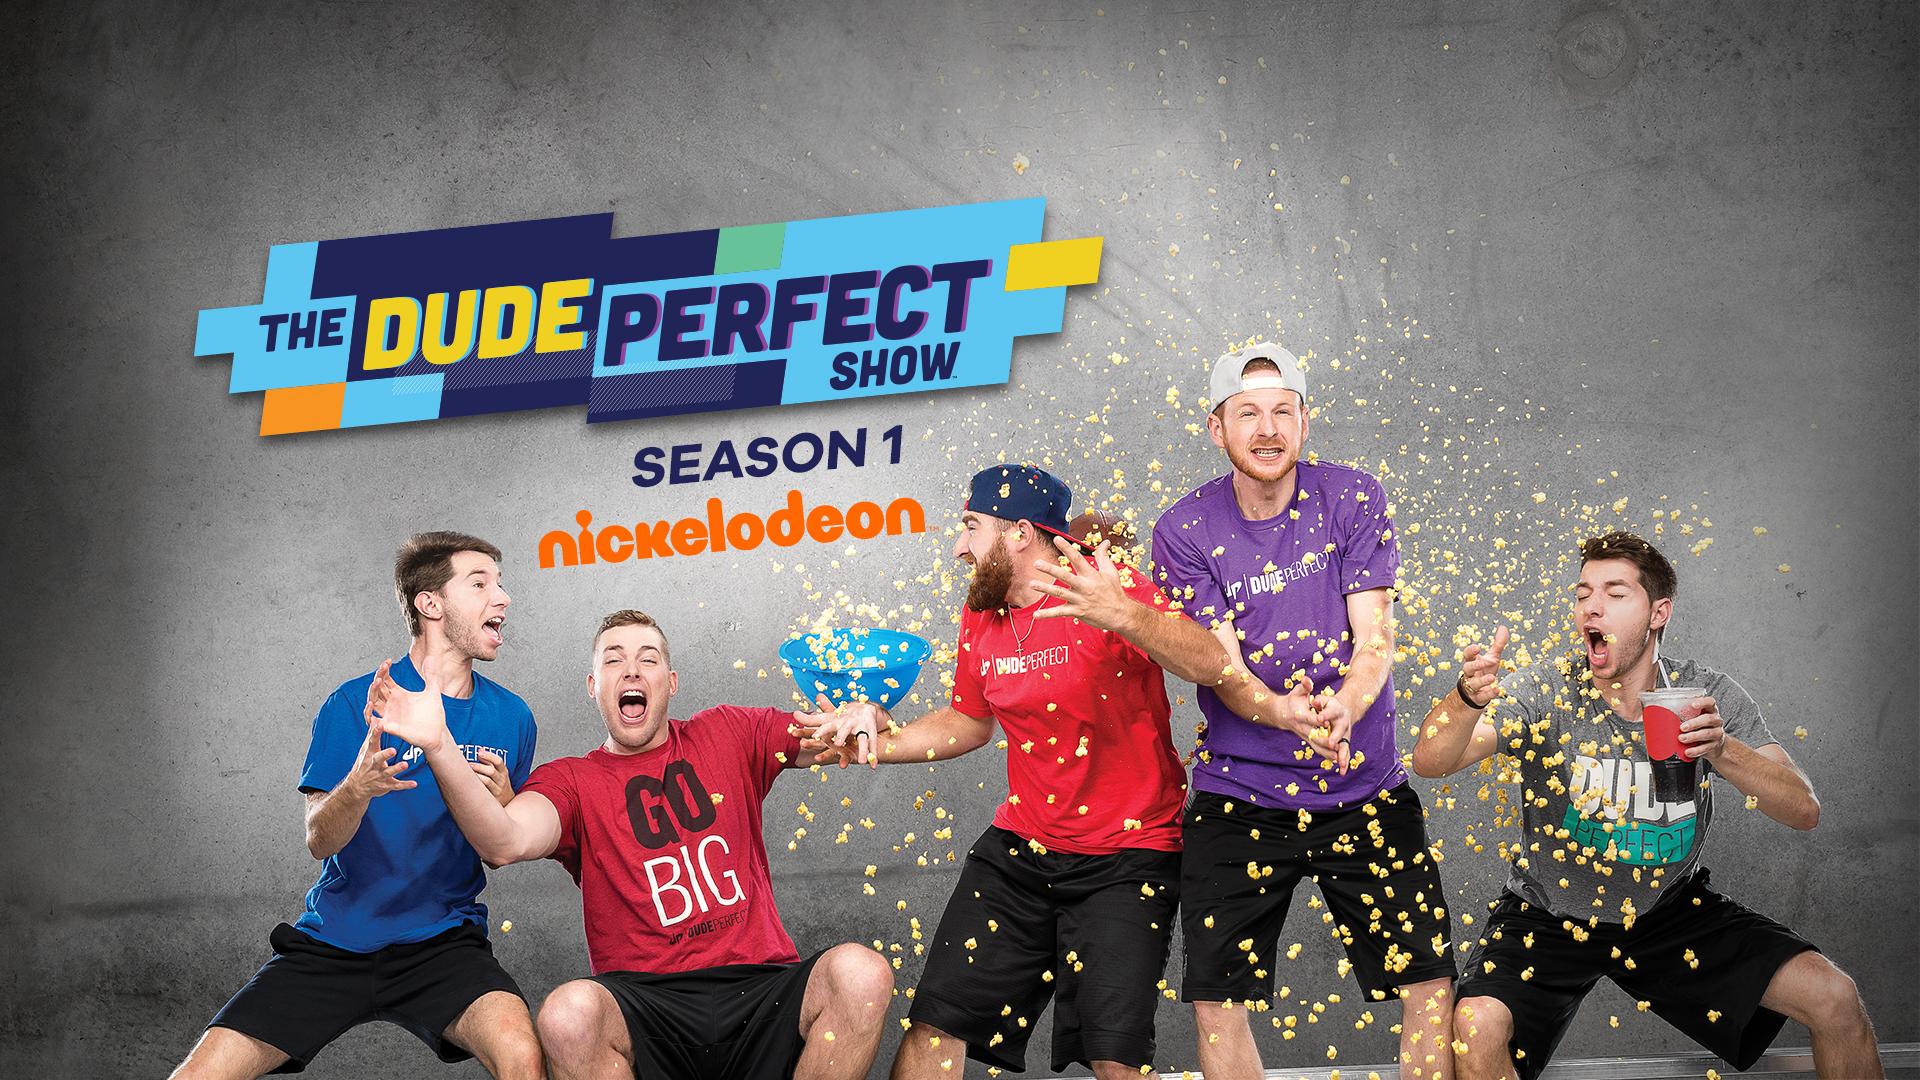 The Dude Perfect Show Season 1